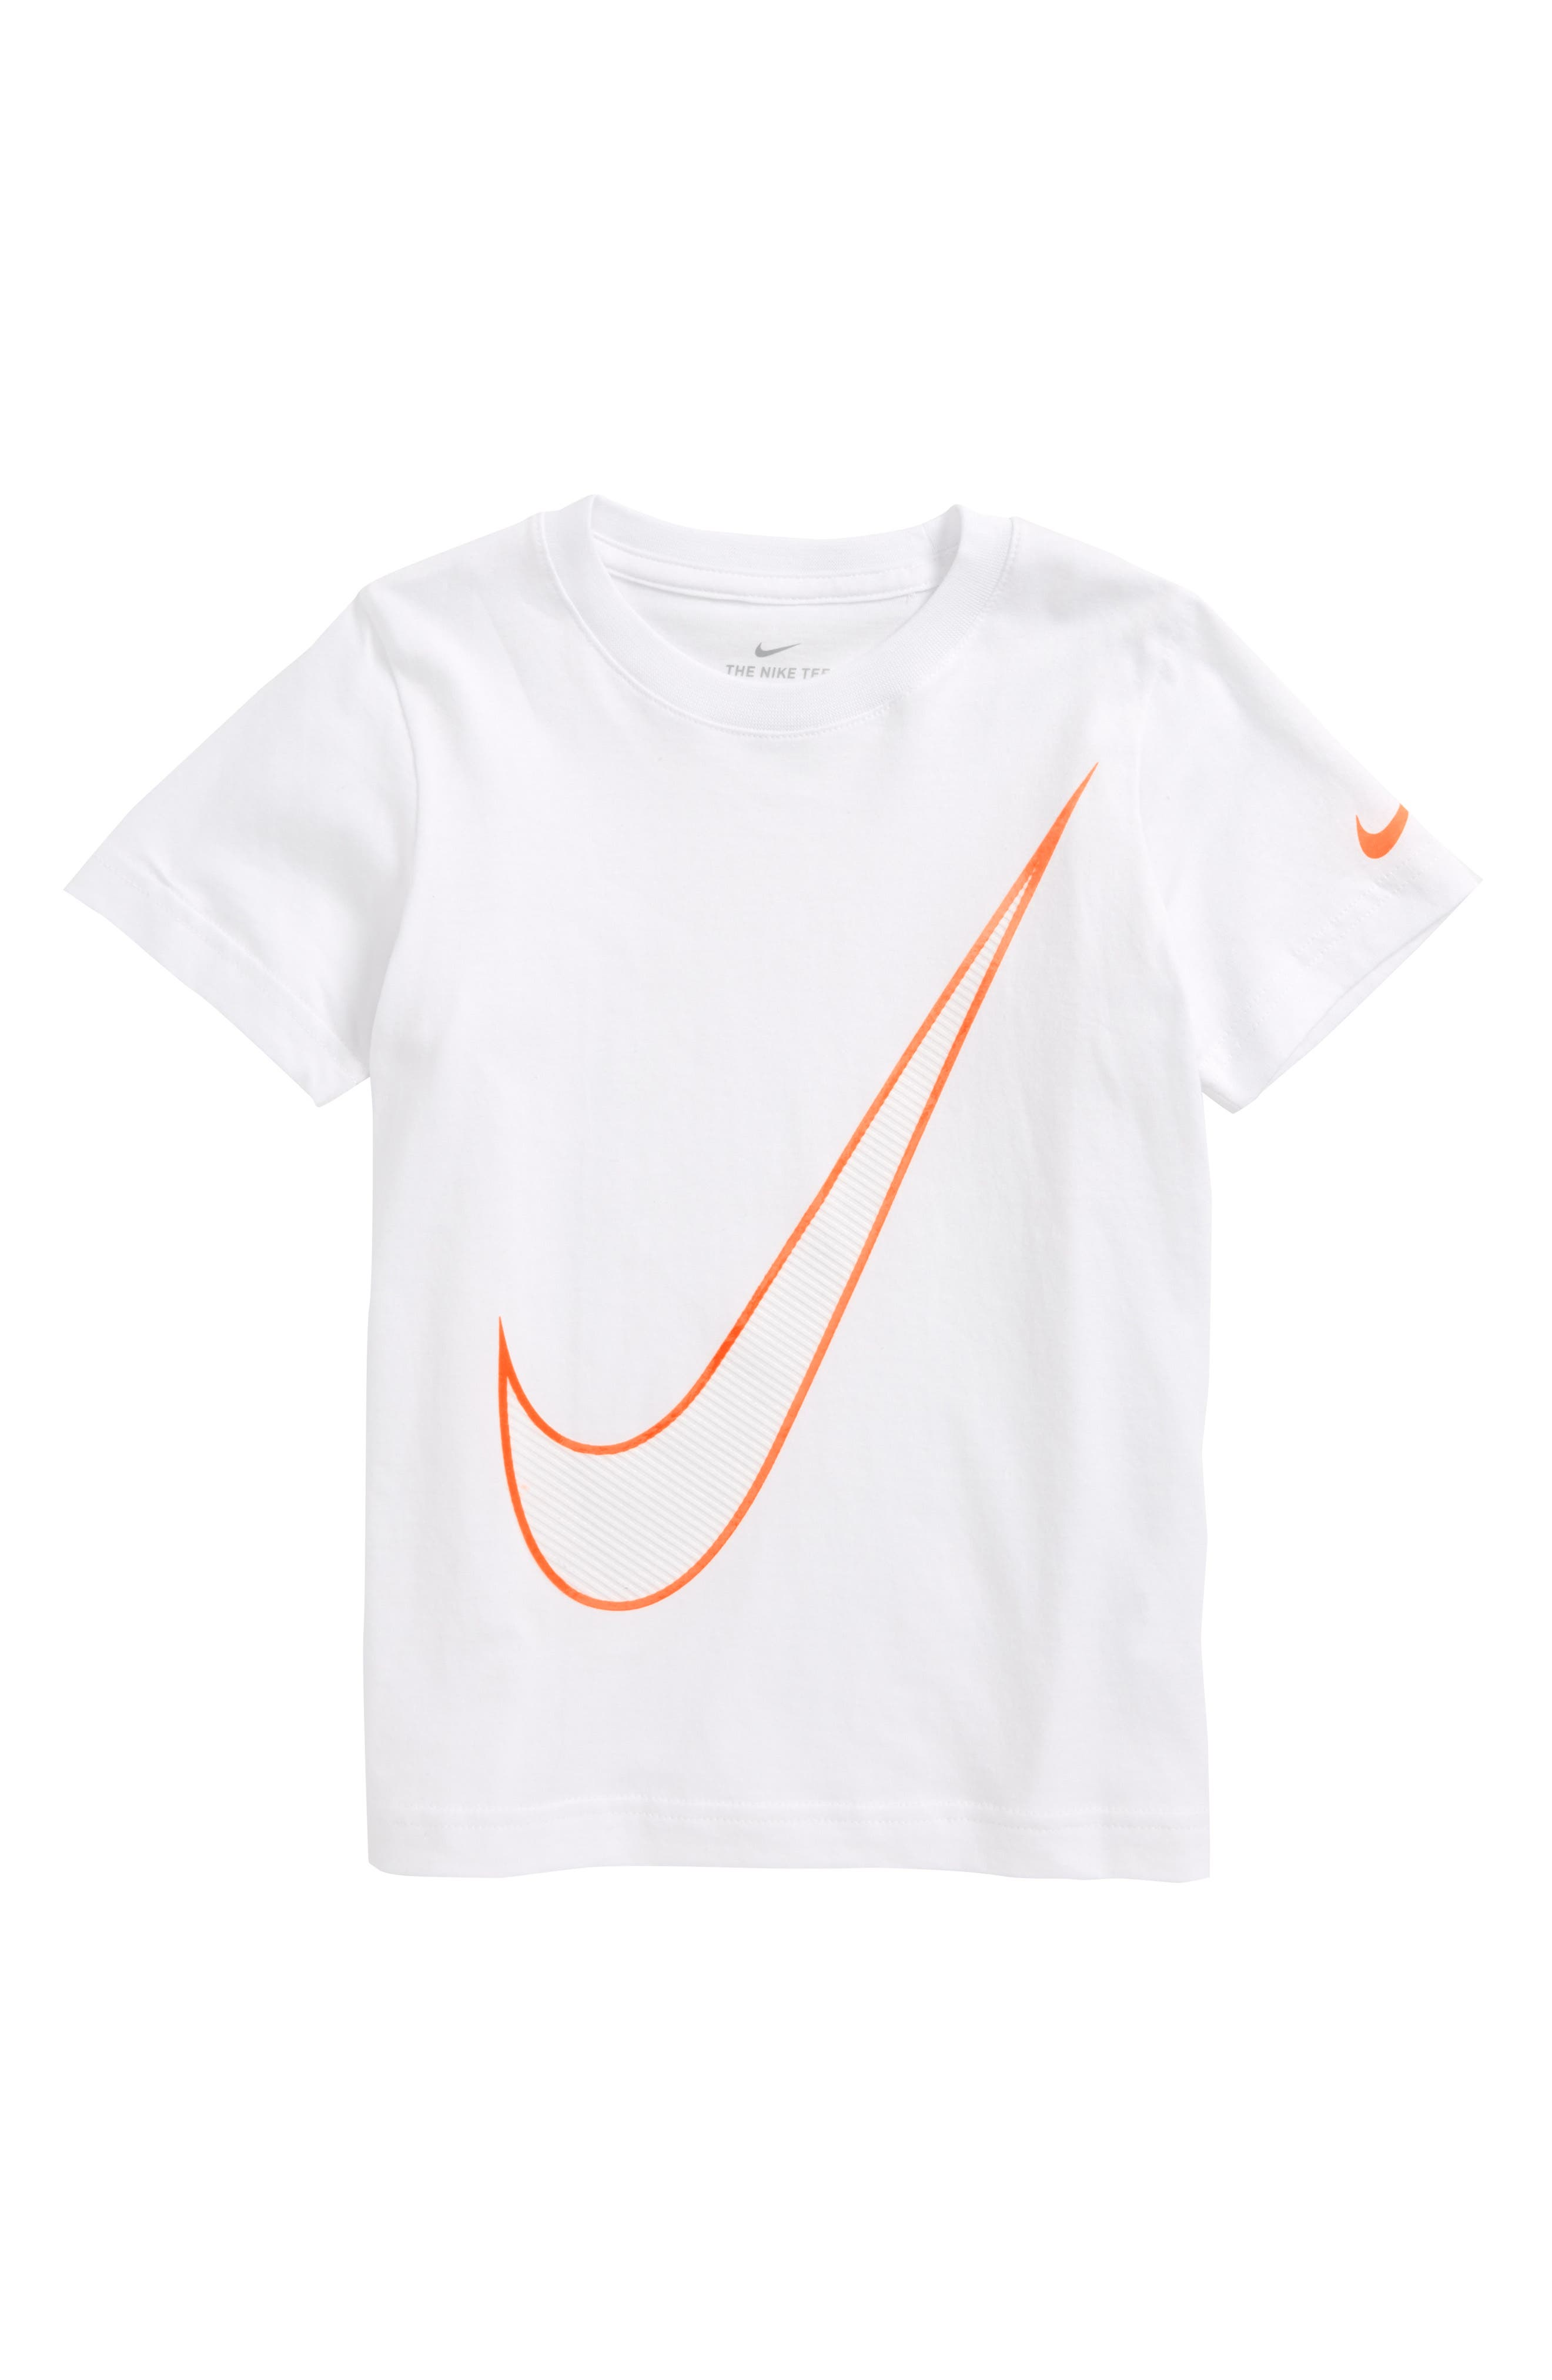 Nike Oversize Swoosh Graphic T-Shirt (Toddler Boys & Little Boys)